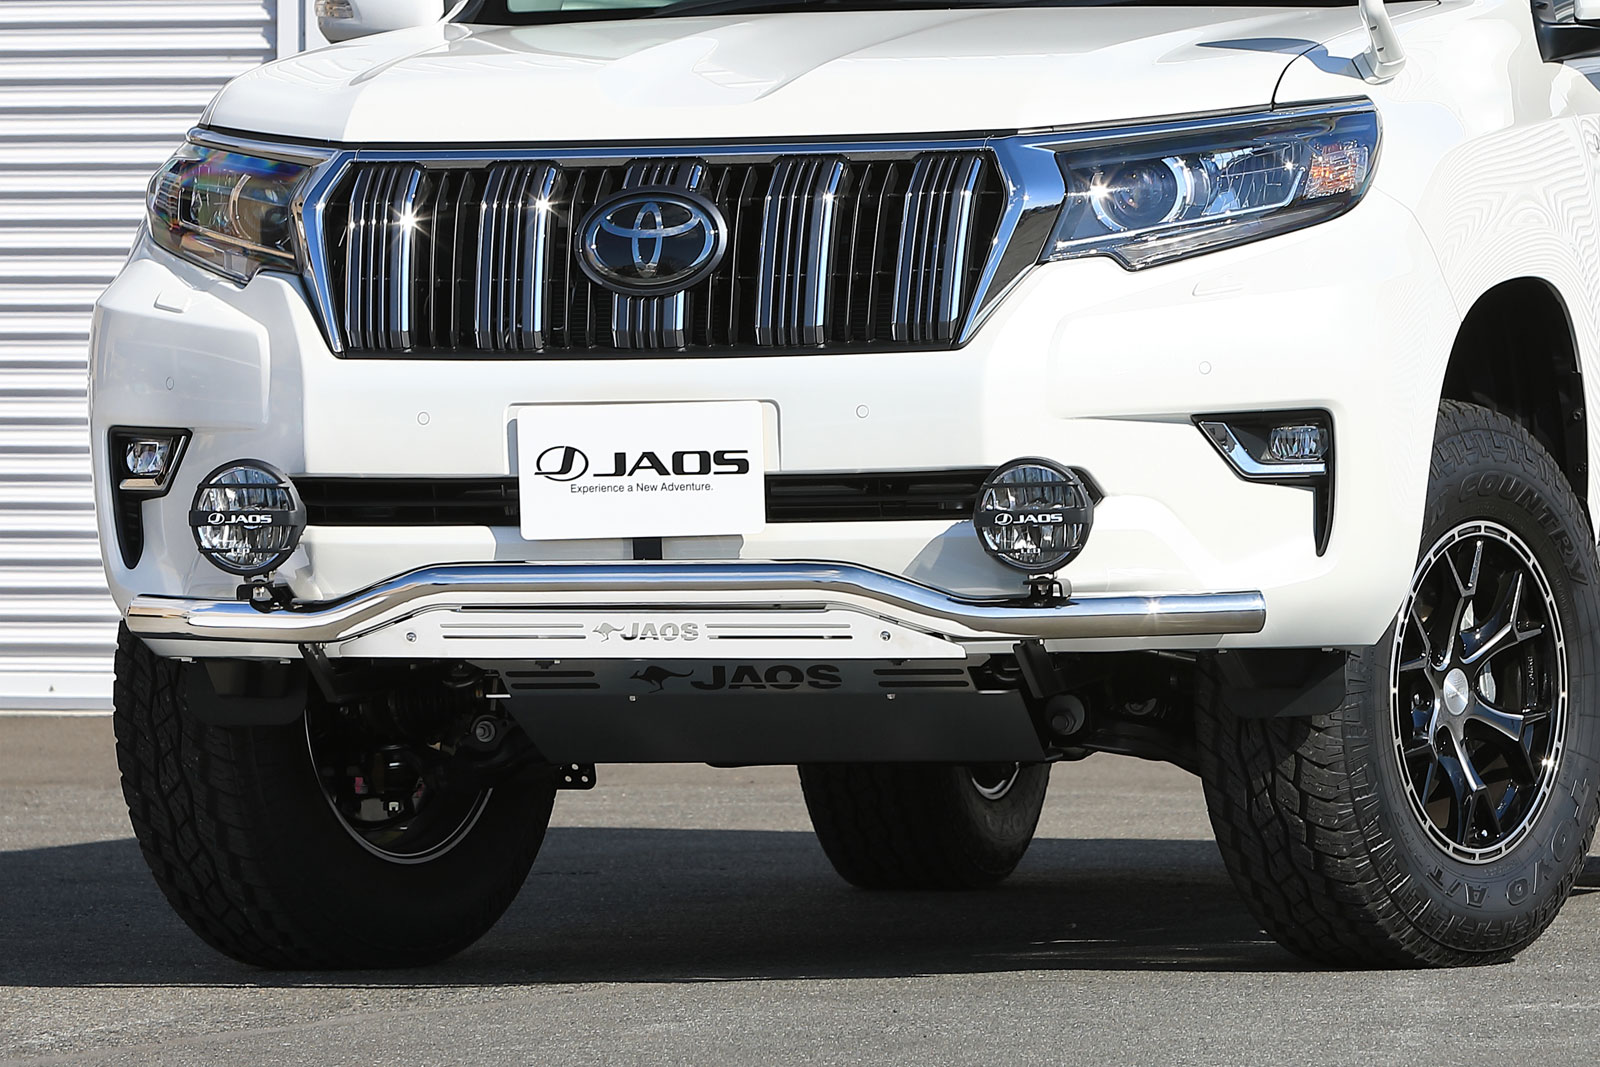 JAOS ジャオス フロントスキッドバー ポリッシュ/ブラスト トヨタ プラド 150系 17/09- 適応:ALL【B150067A】